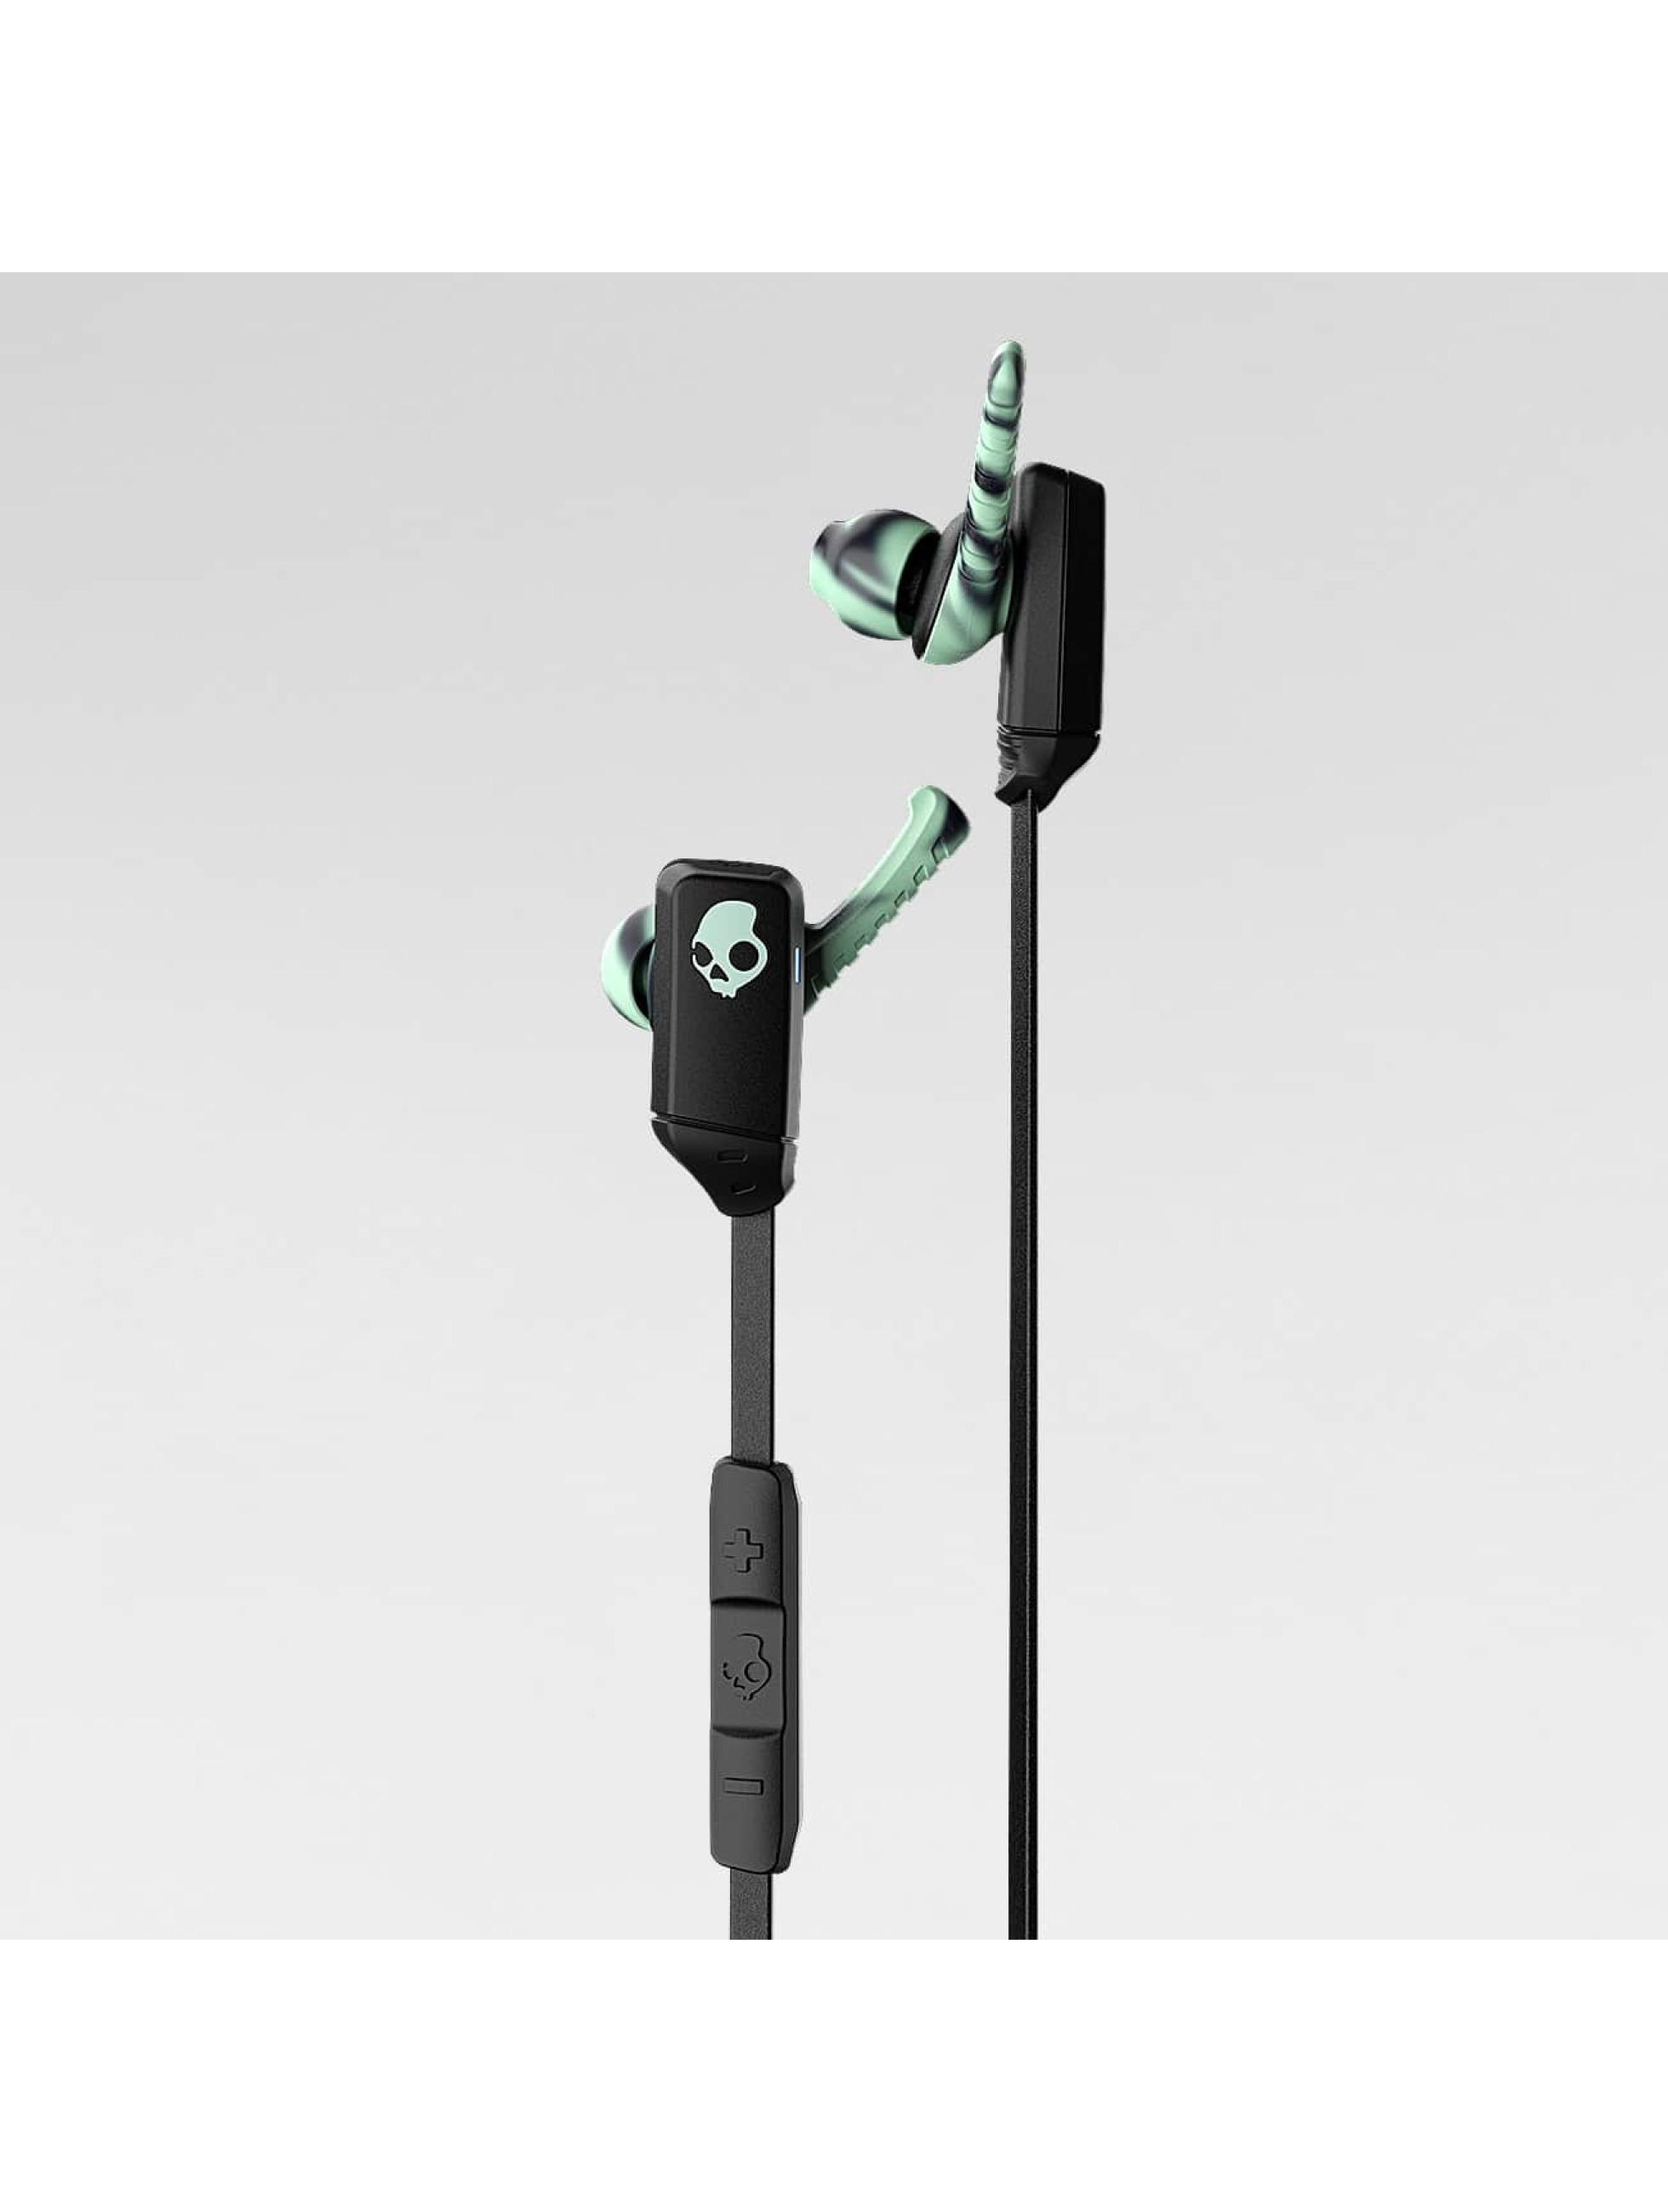 Skullcandy Høretelefoner Xtfree Wireless sort